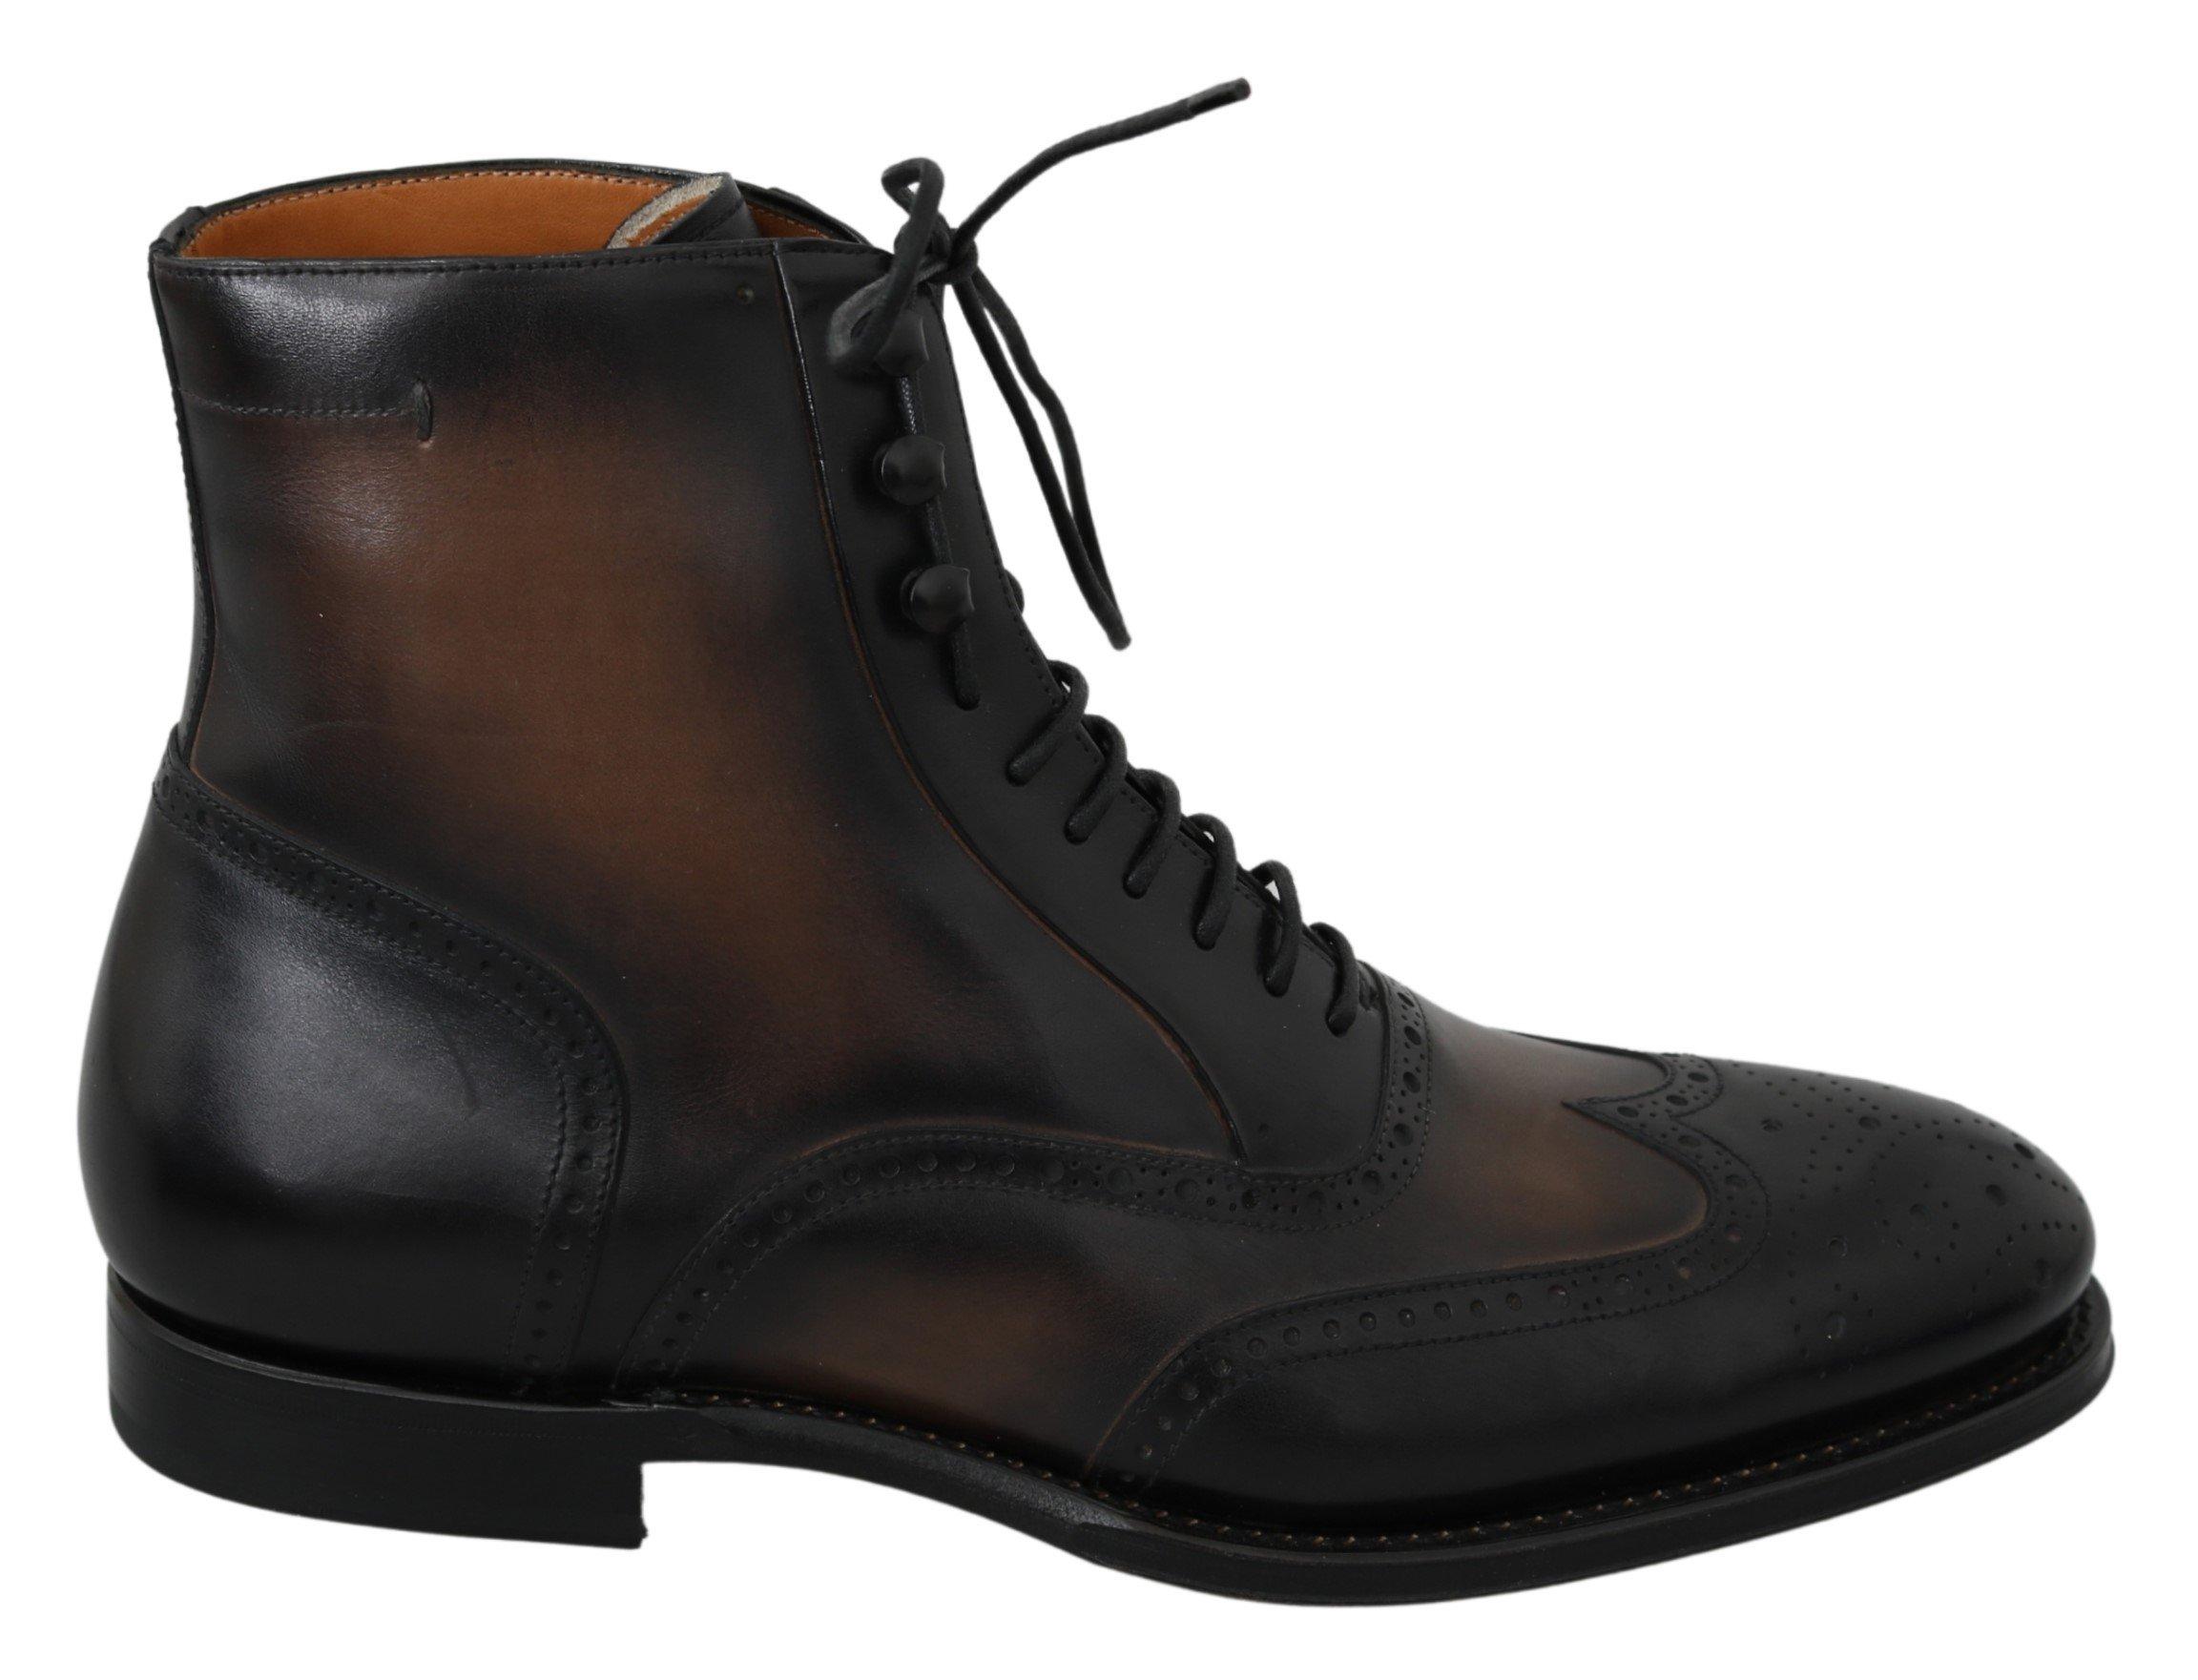 Dolce & Gabbana Men's Leather Lace Boot Black MV2851 - EU42/US9